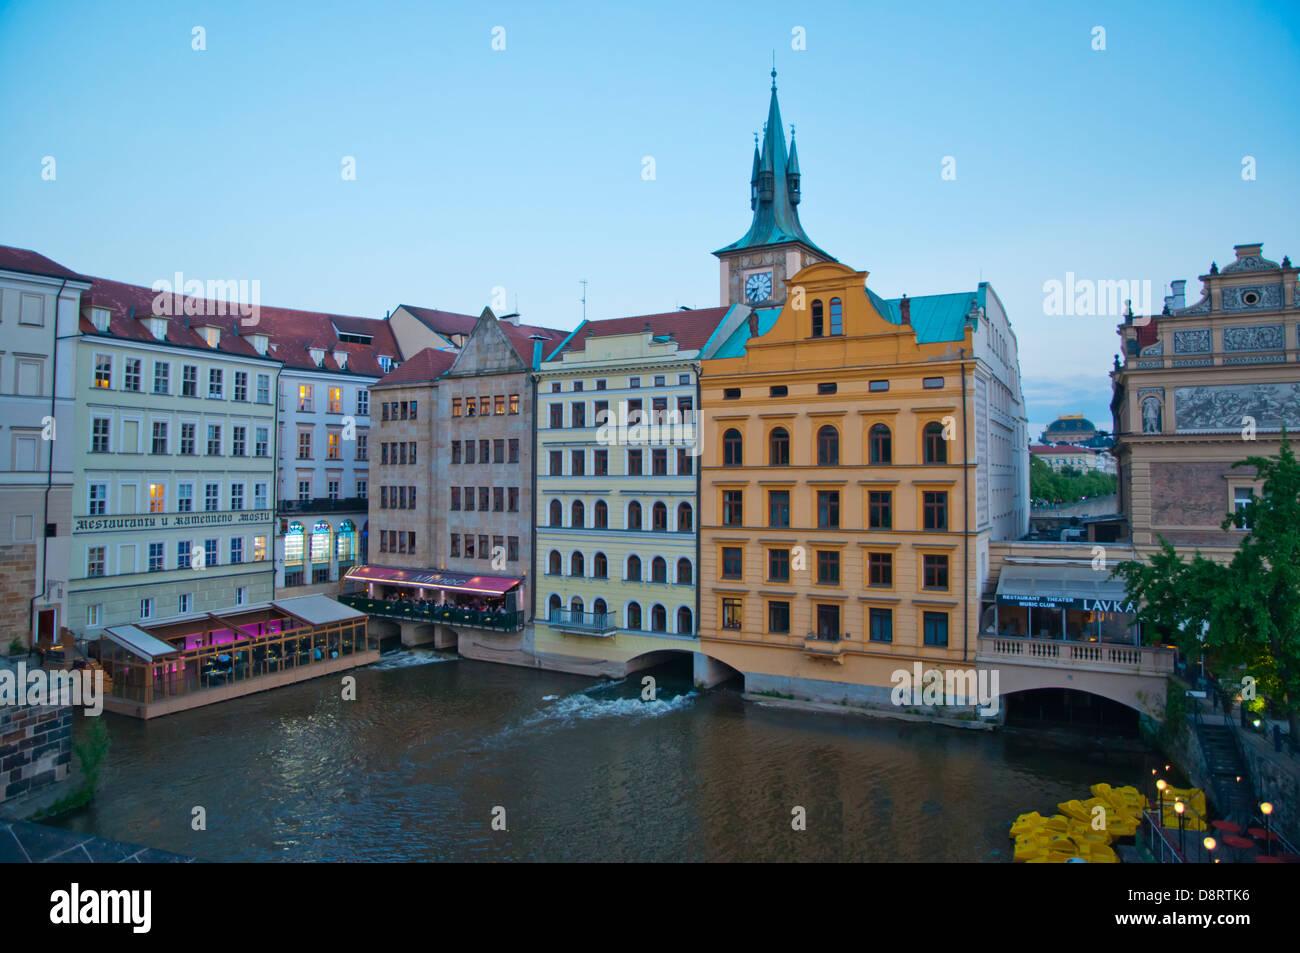 Buildings and restaurant terraces at Novotneho Lavka by river Vltavaold town Prague city Czech Republic Europe - Stock Image